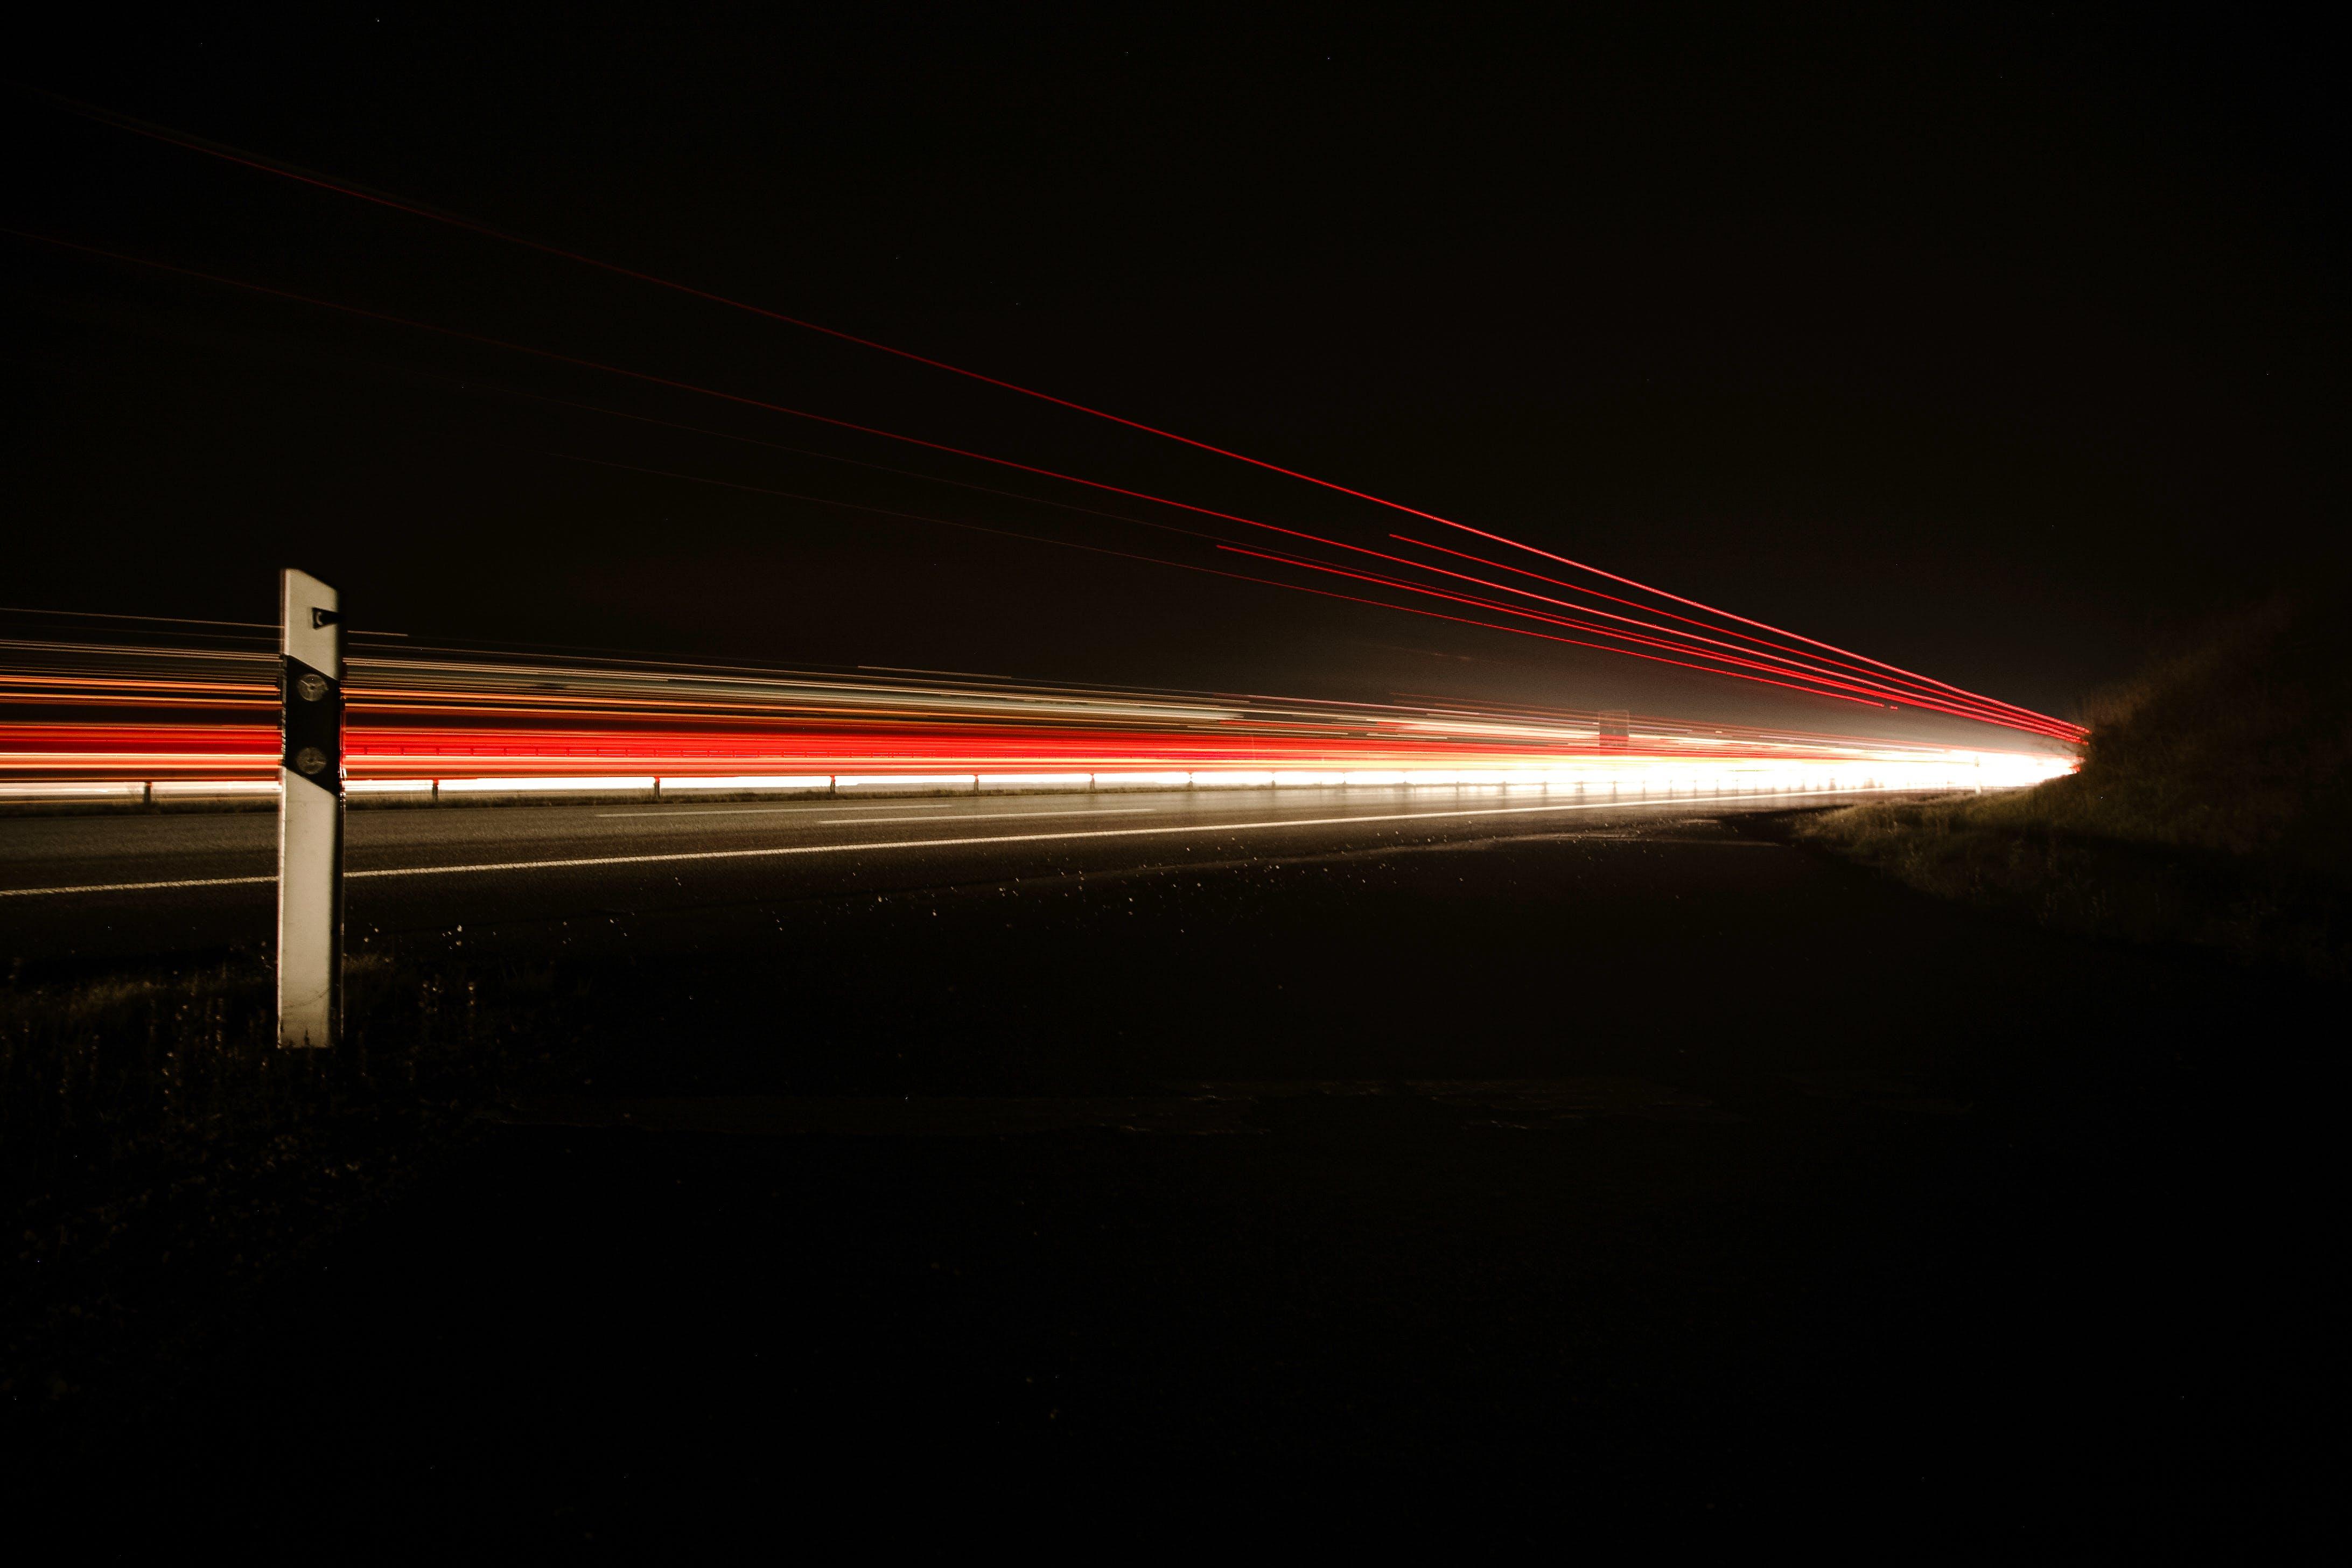 Night Photo of Car Lights on Bridge